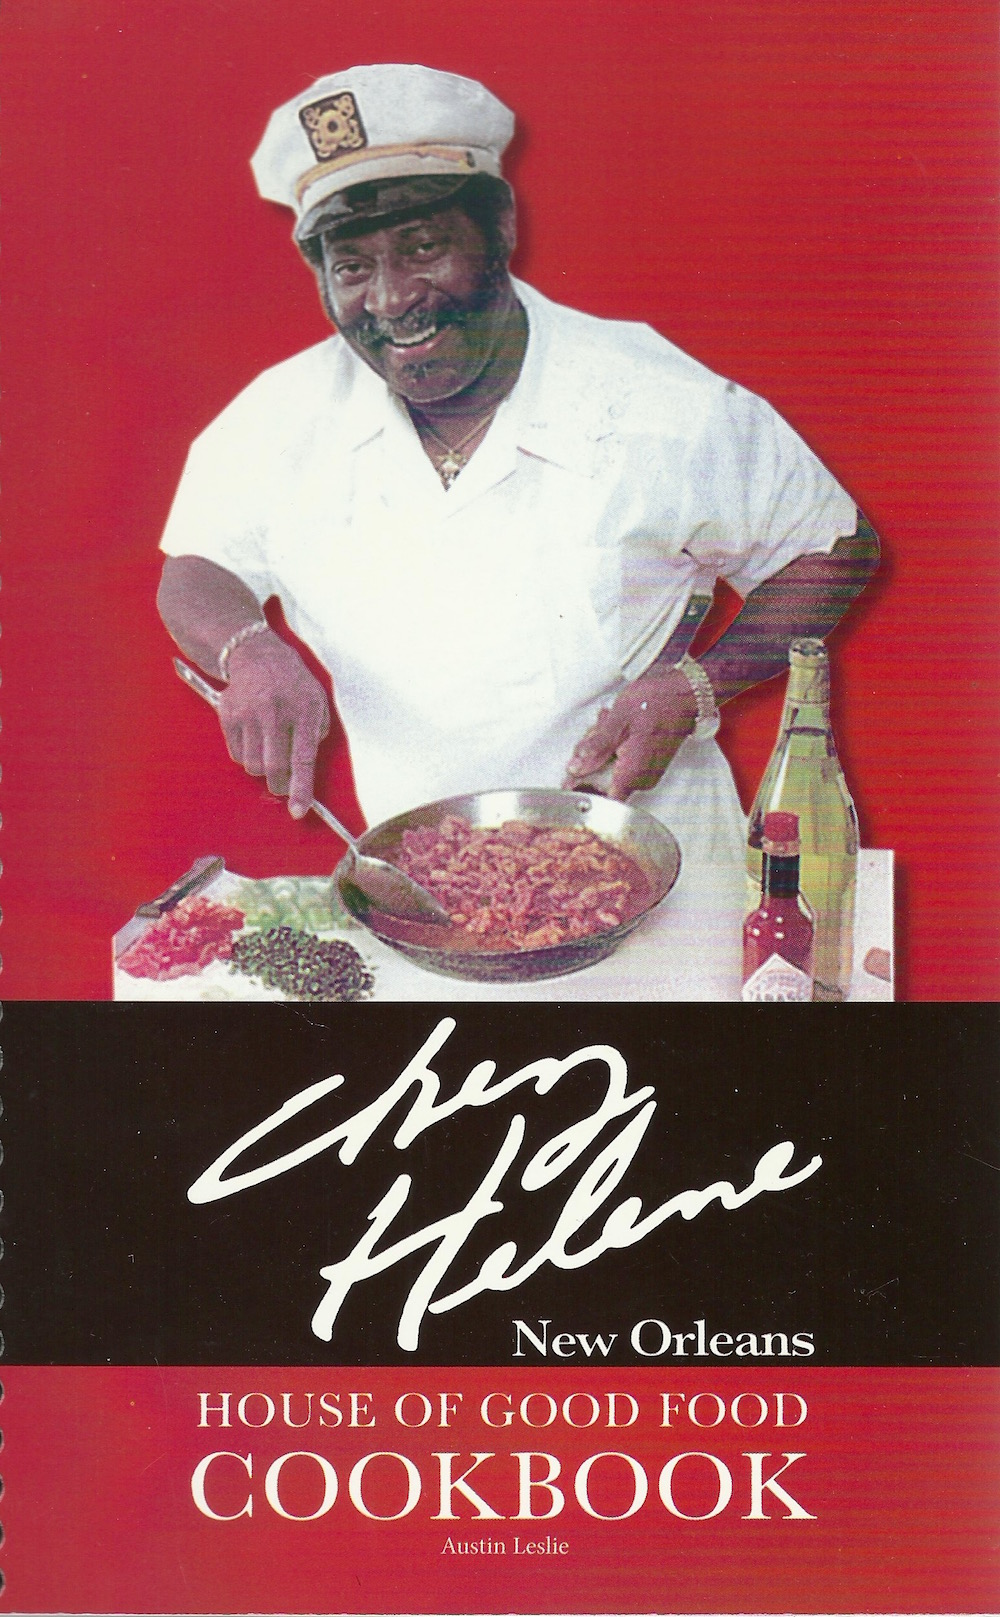 Chez Helene New Orleans House of Good FOod Cookbook by Austin Leslie de Simonin Publications New Orleans, Louisana 1984